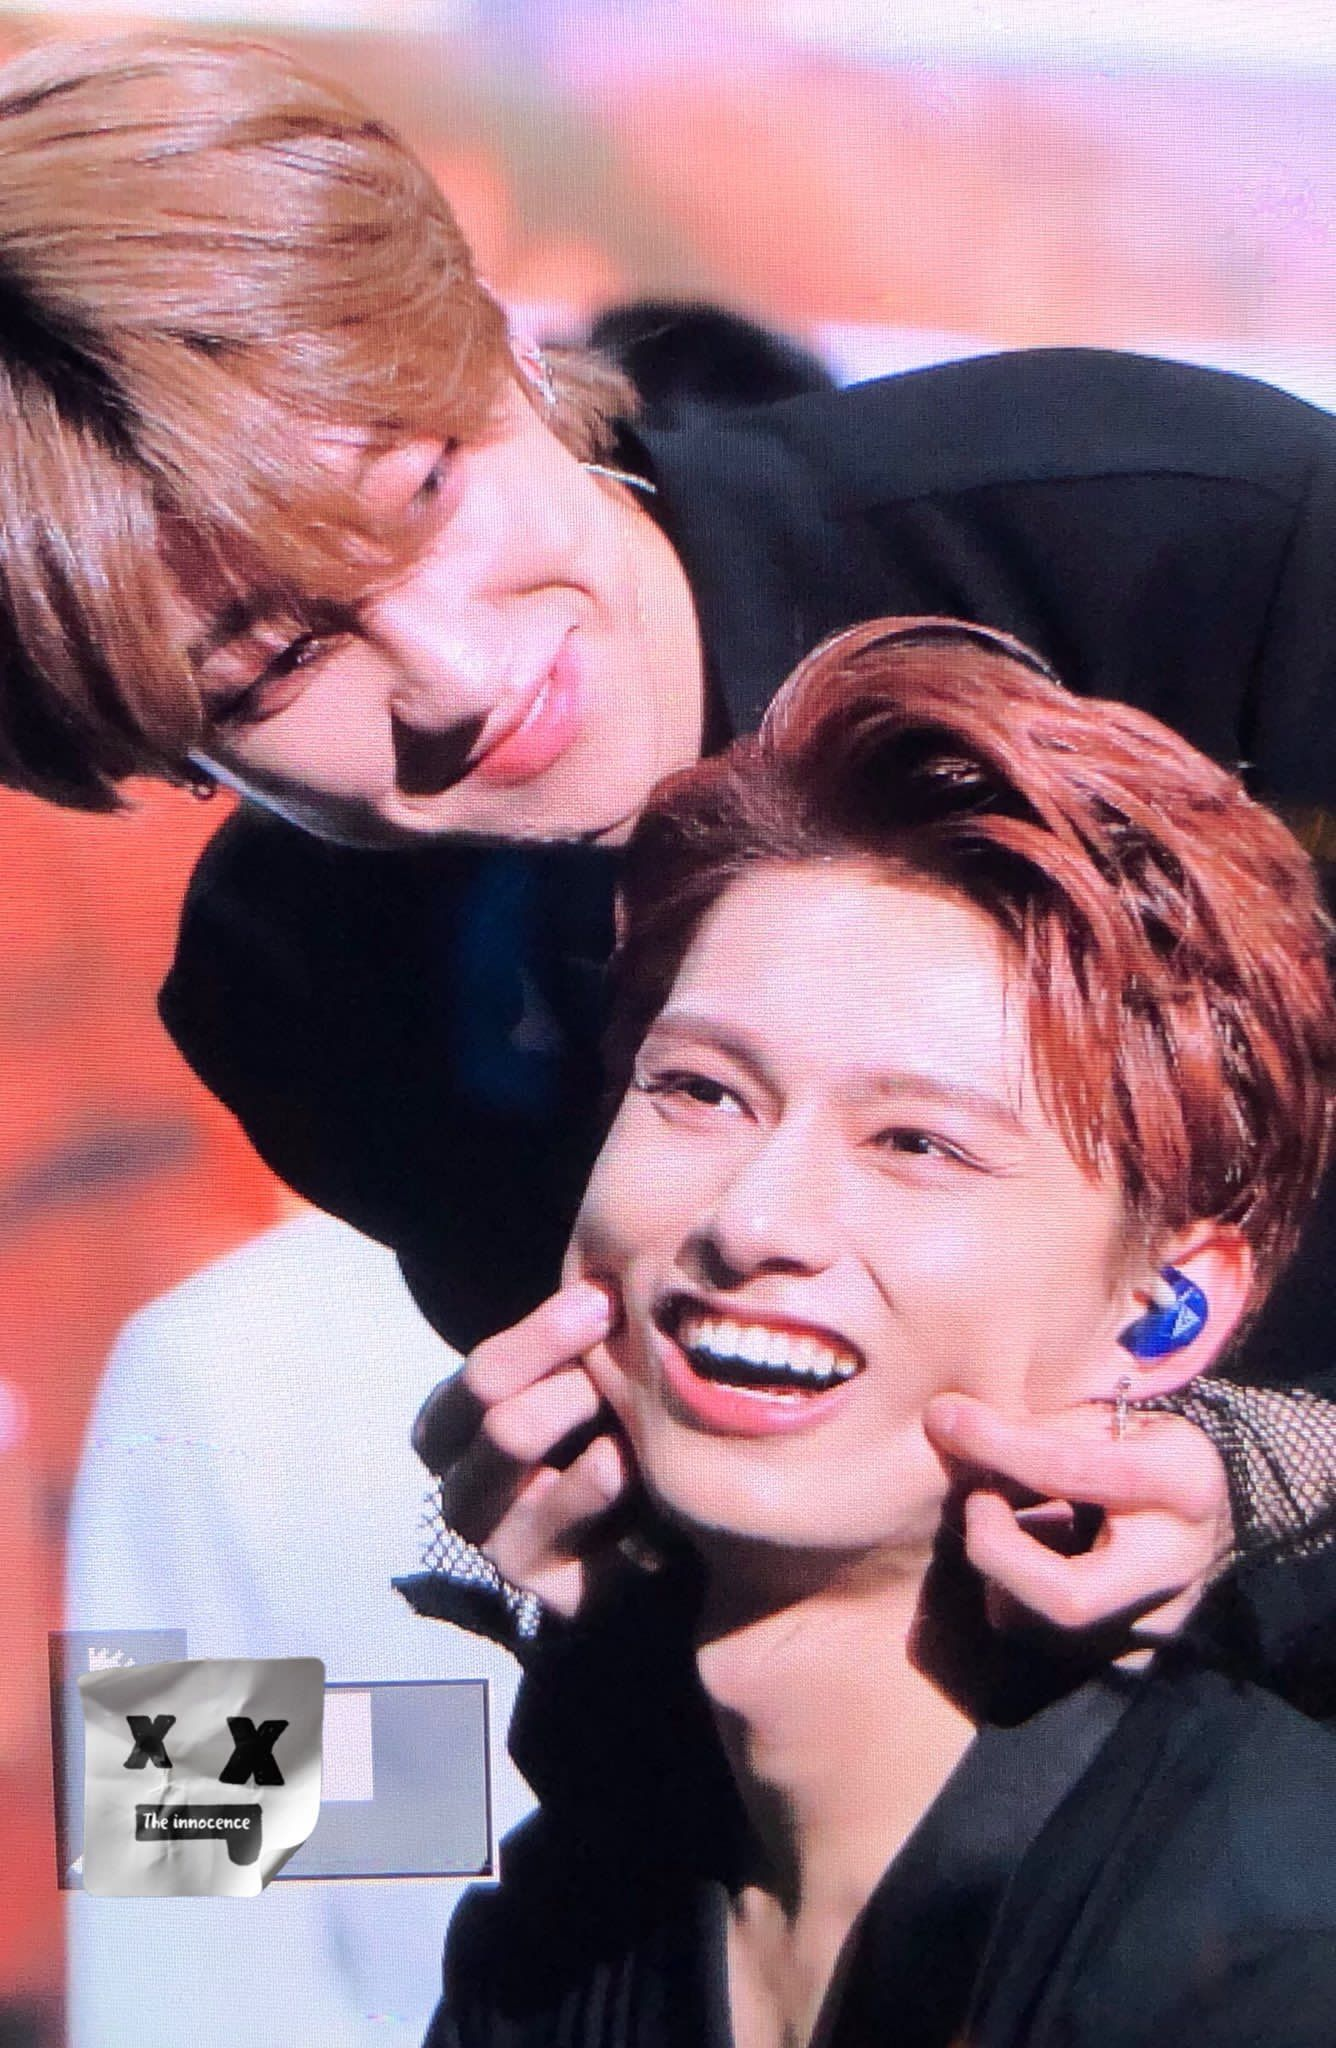 Jun #The8 #seventeen | Kpop/kdrama in 2019 | Seventeen jun